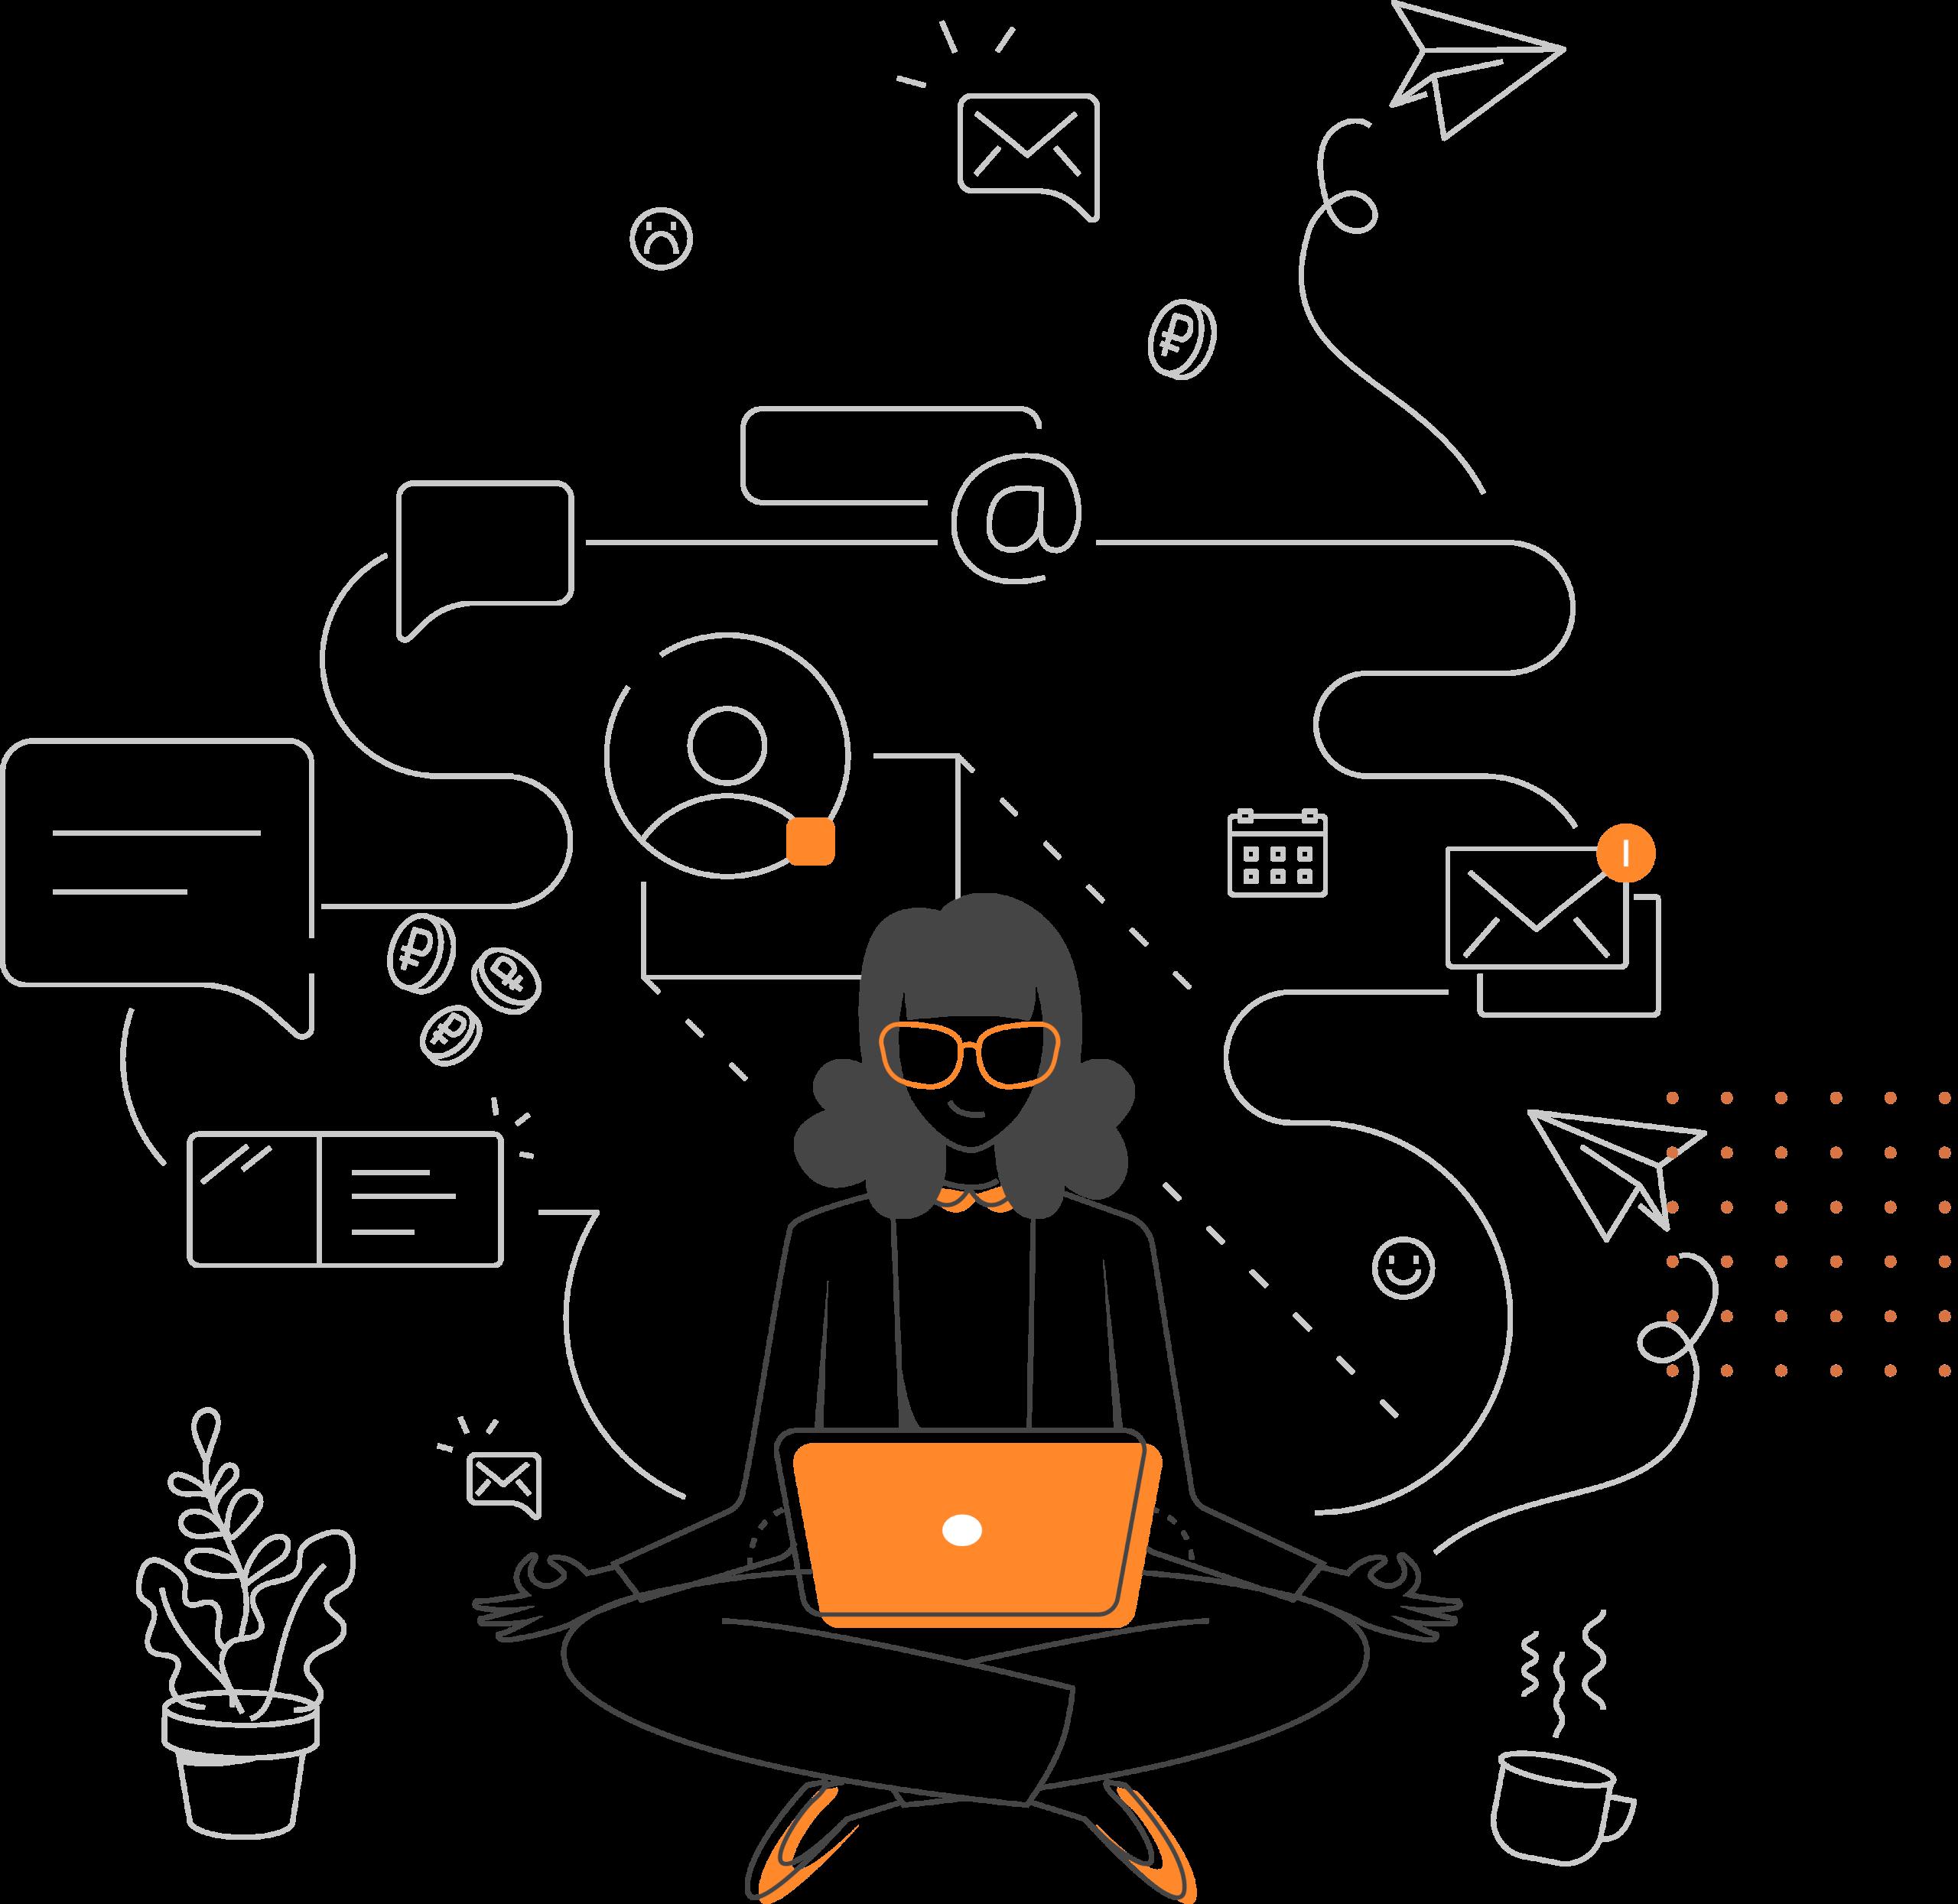 инструменты автоматизации маркетинга